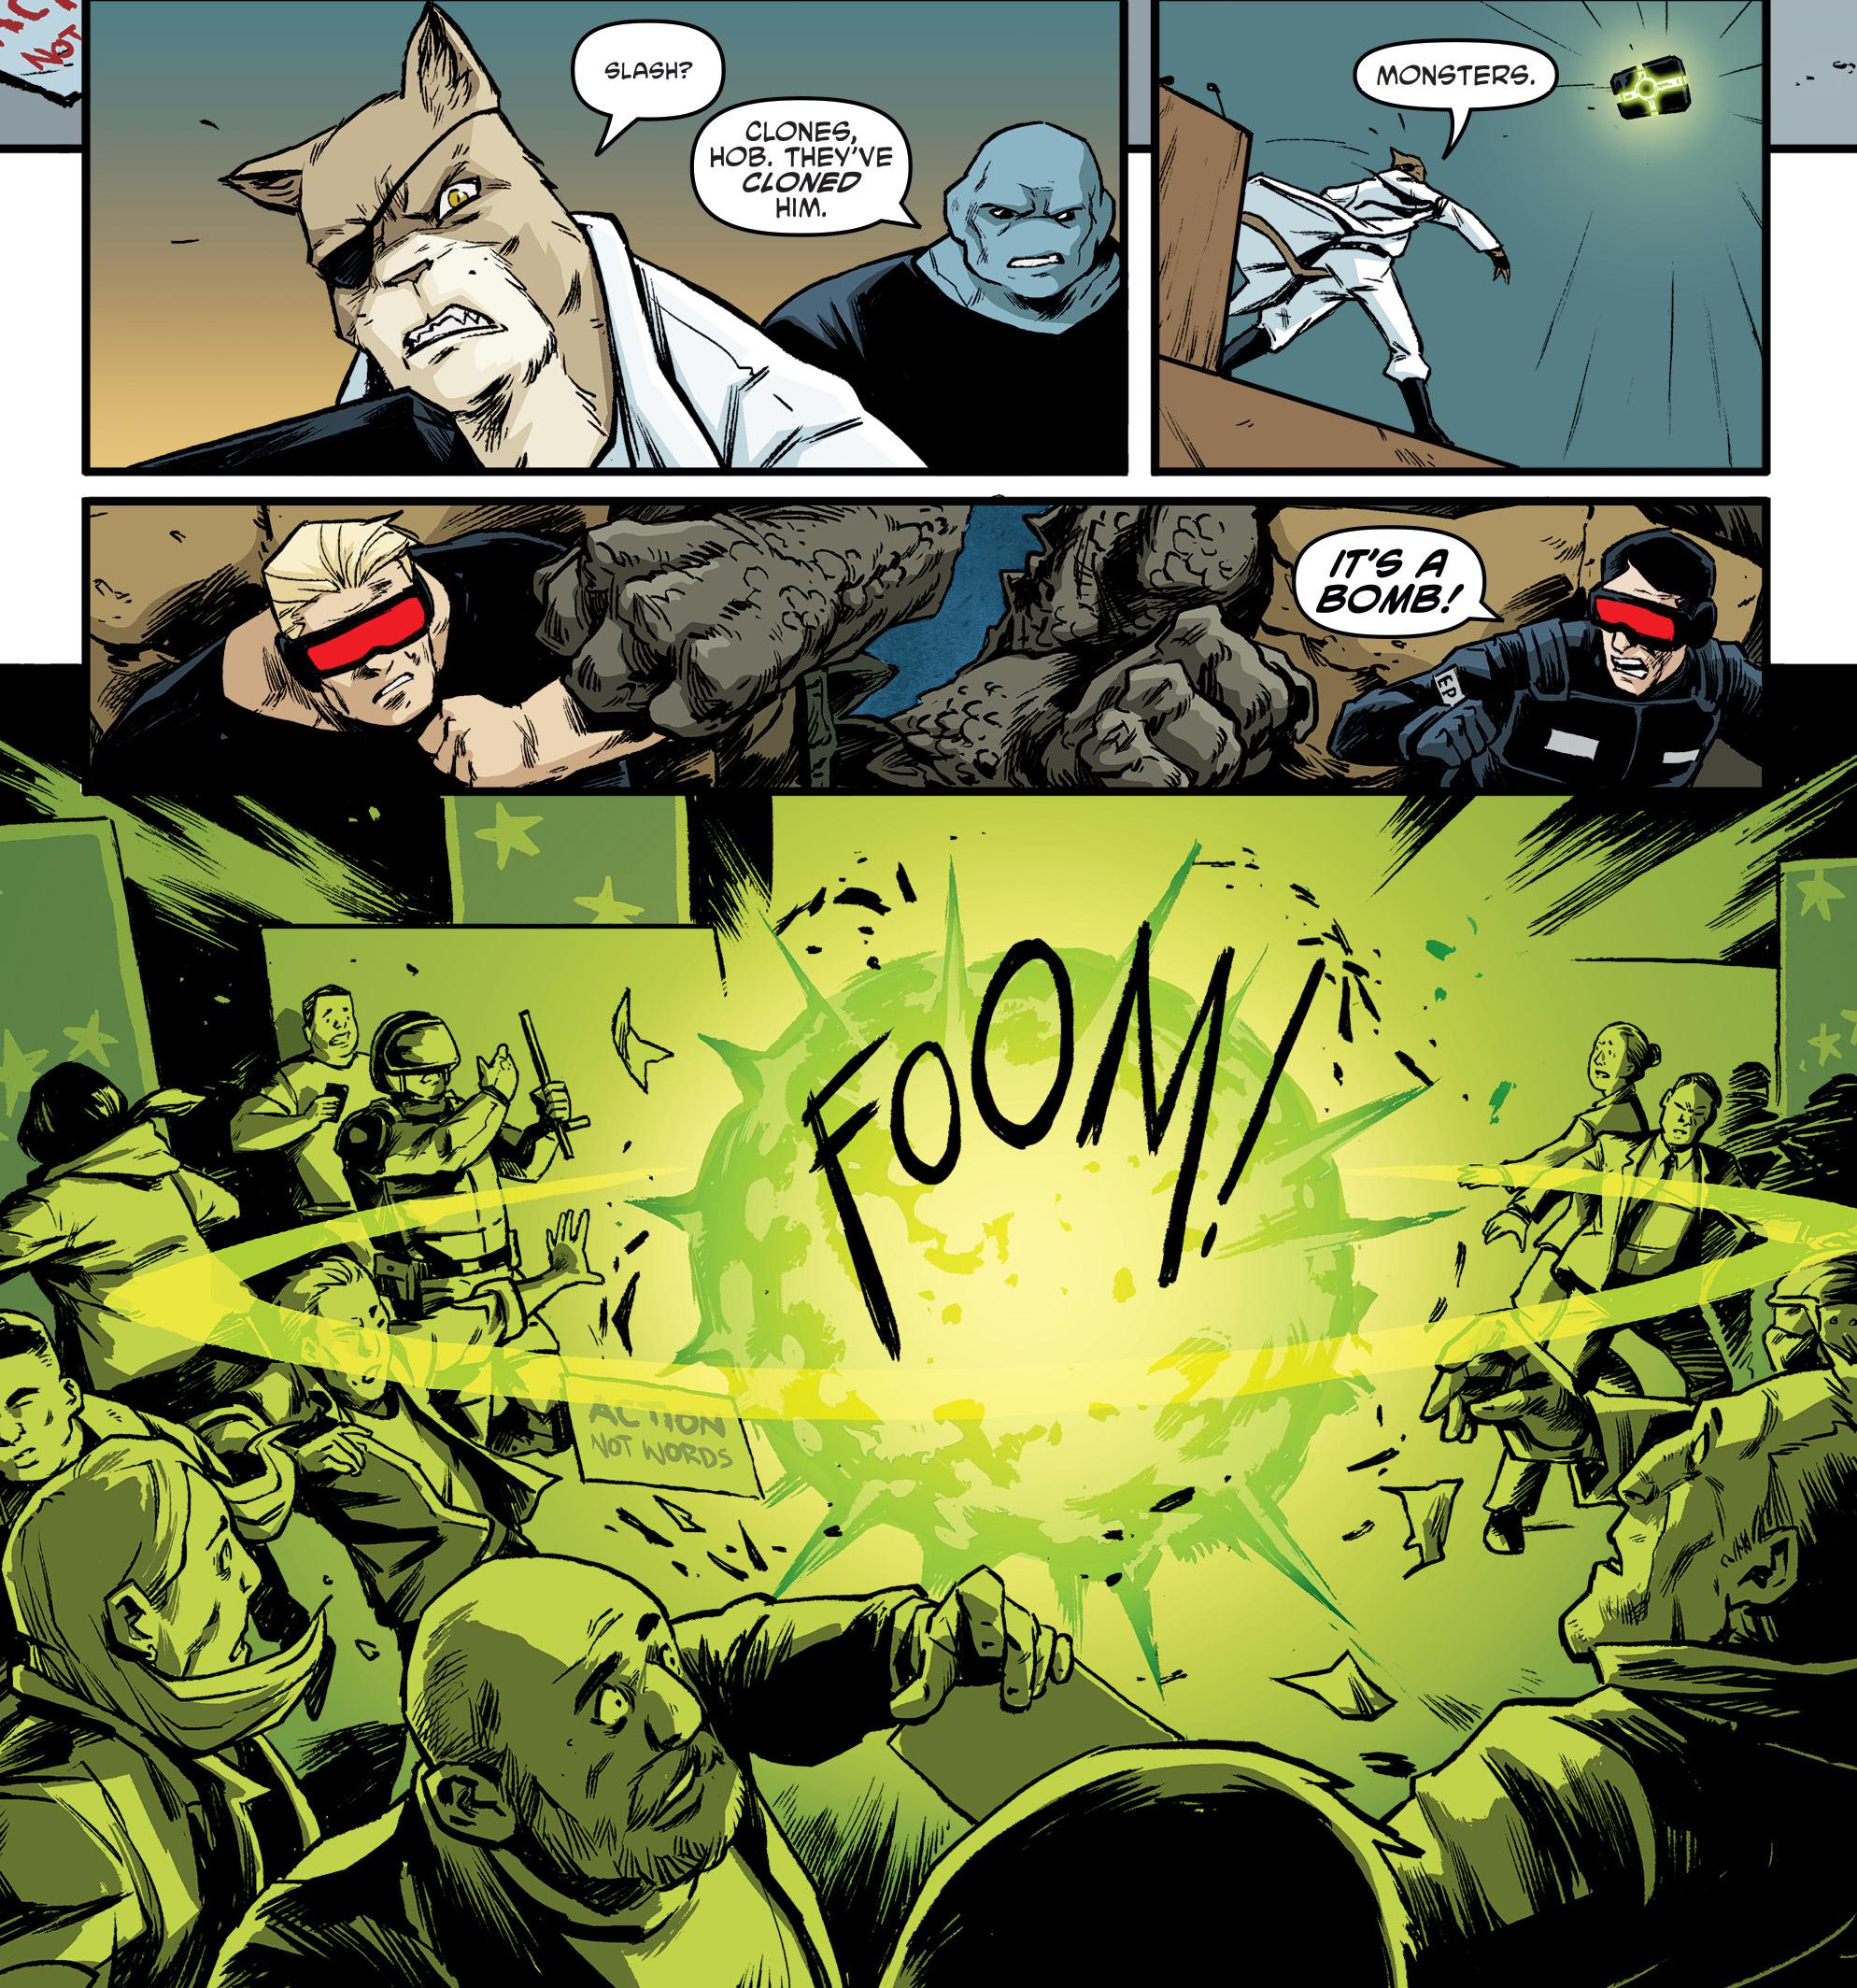 Mutagen bomb (IDW)